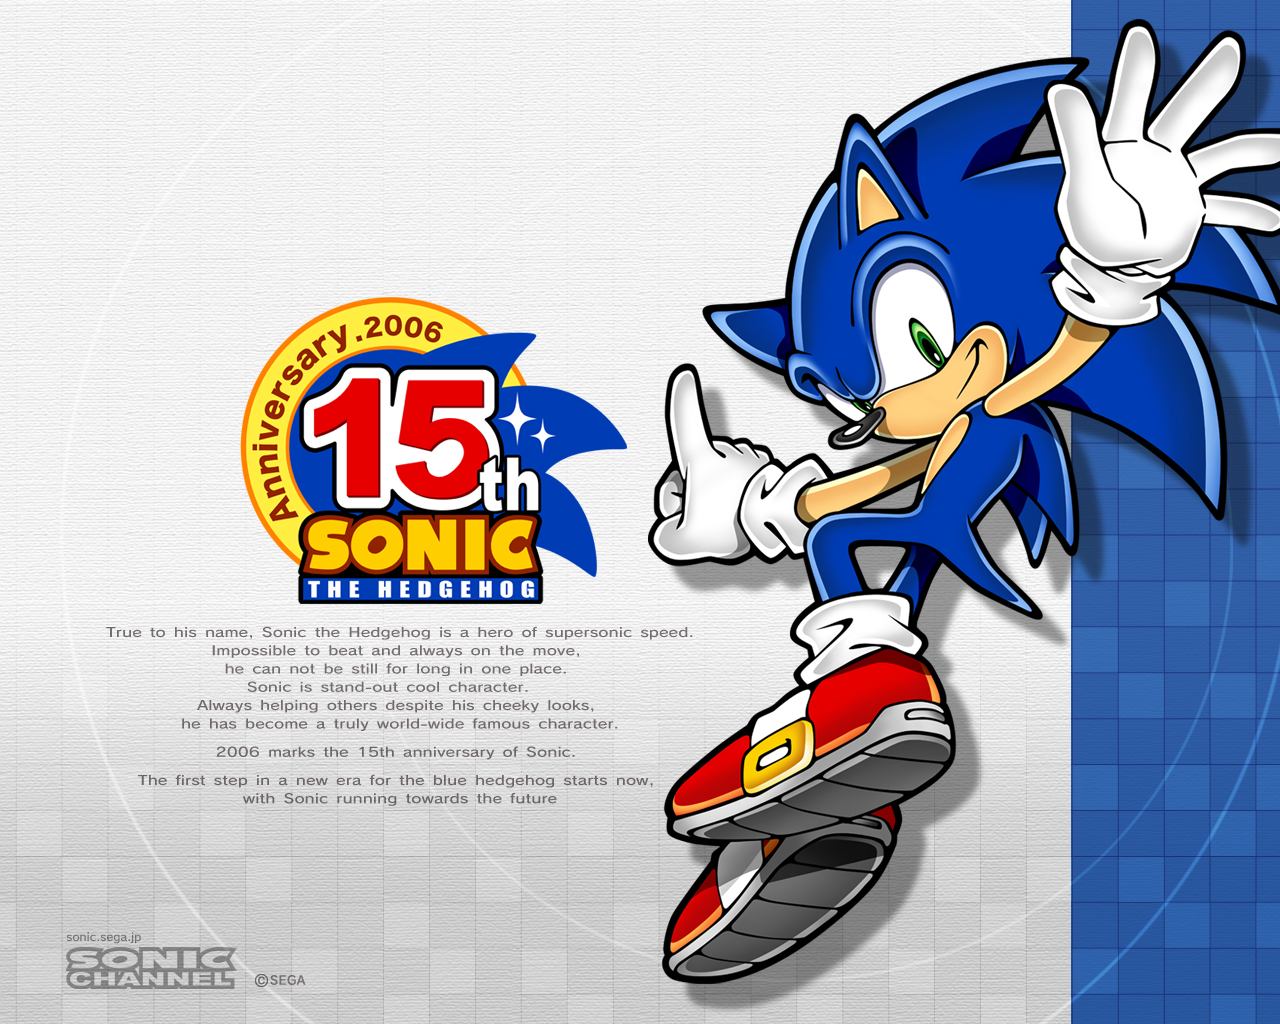 Sonic #6 (15th Anniversary)